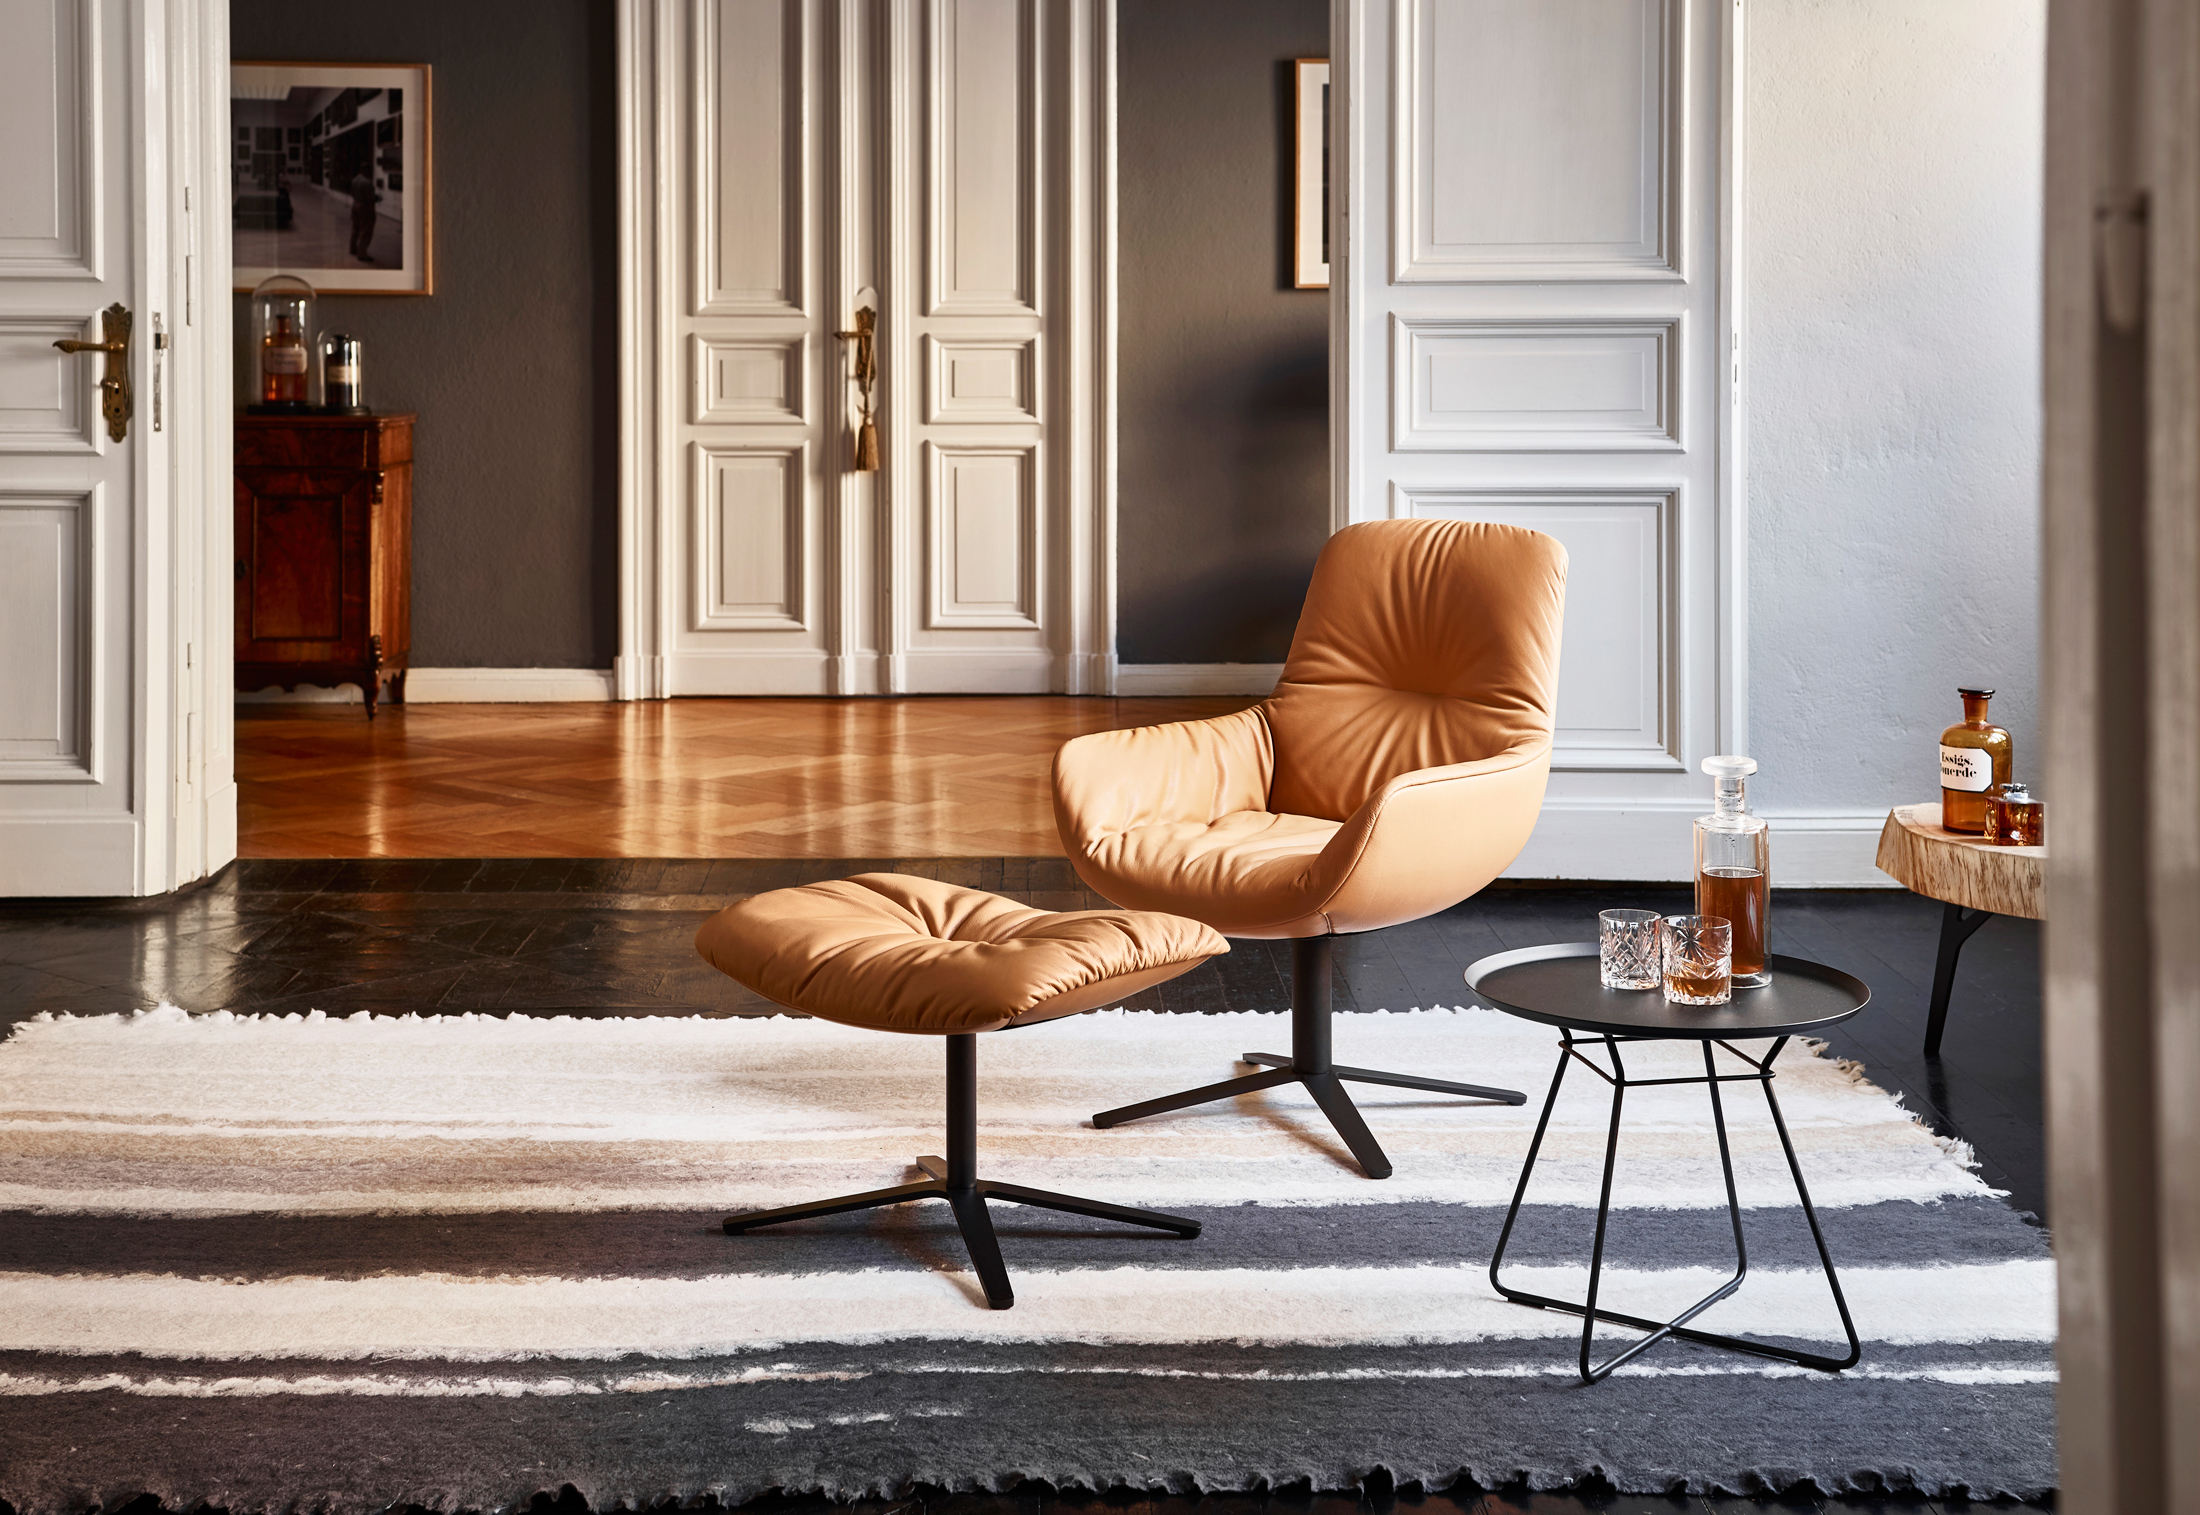 Leya Lounge Chair With X Base Frame By Freifrau Stylepark